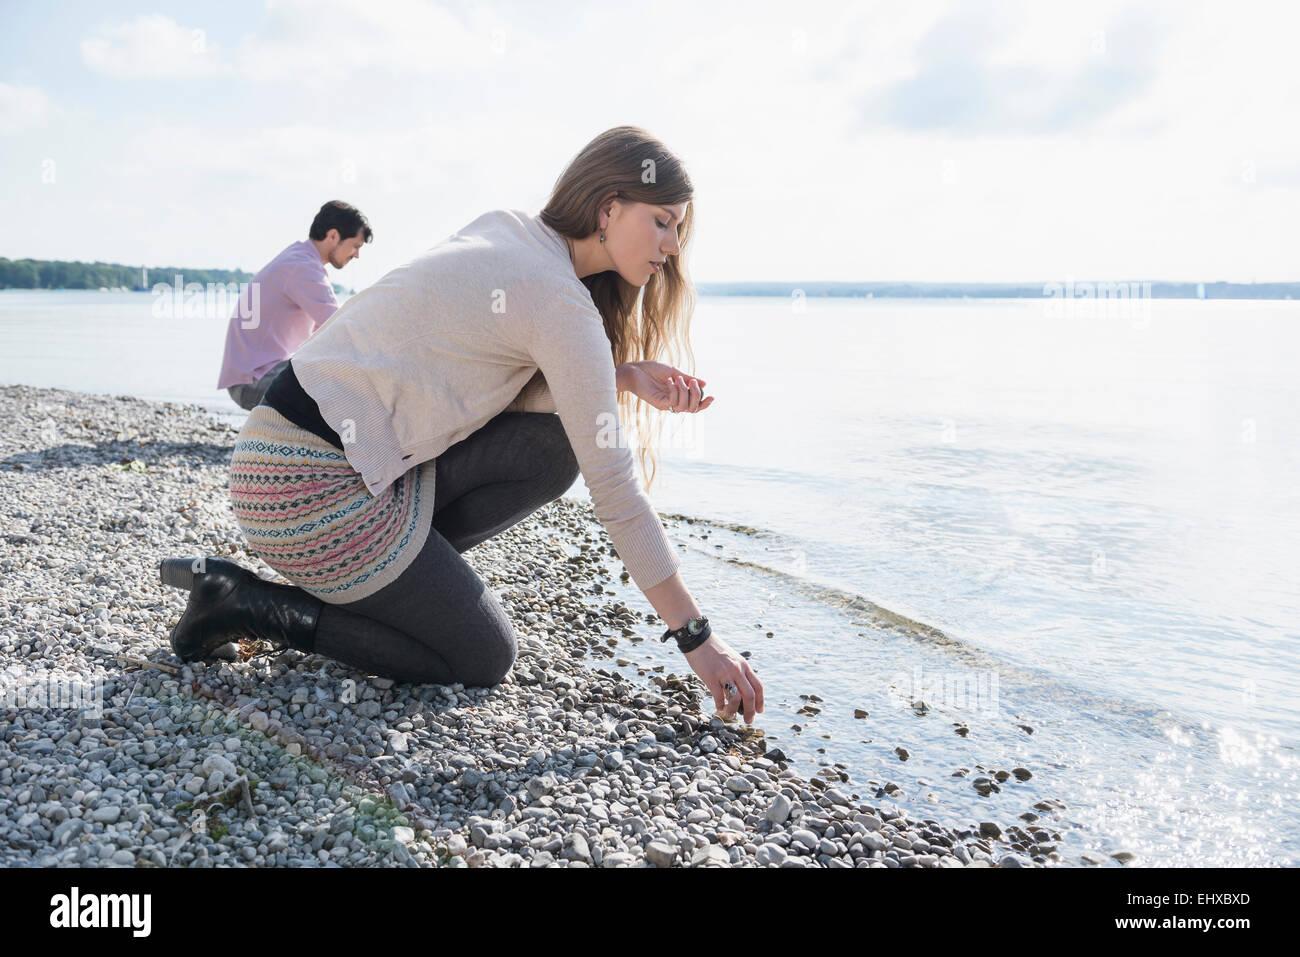 Jeune couple lake shore gathering pebbles Photo Stock